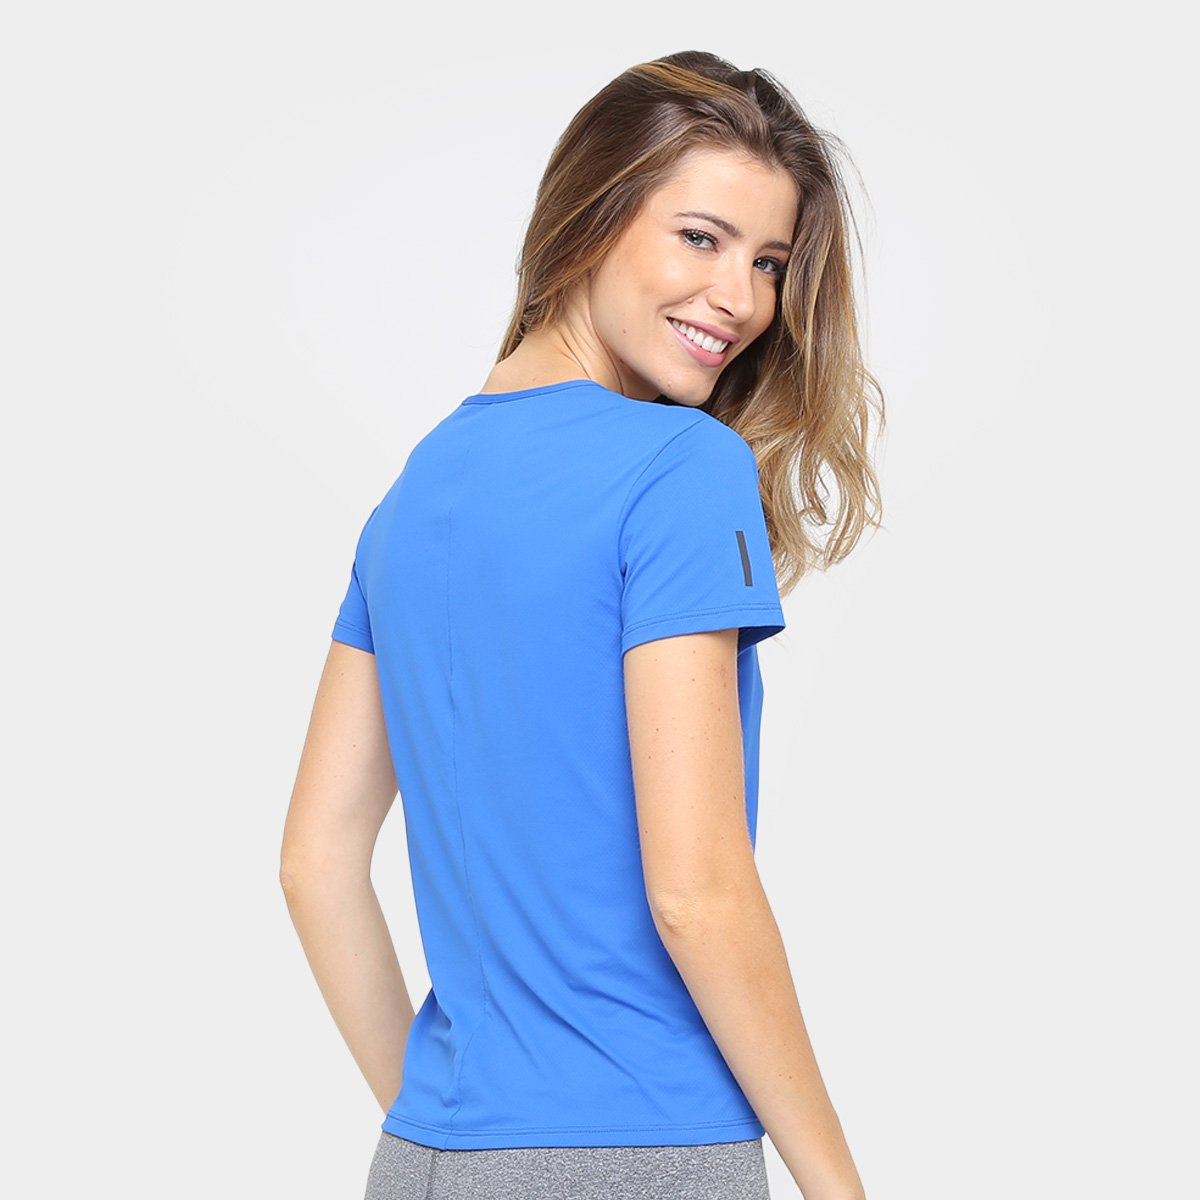 Feminina Camiseta Camiseta Azul Response Adidas Poliamida Adidas wPg5qv5